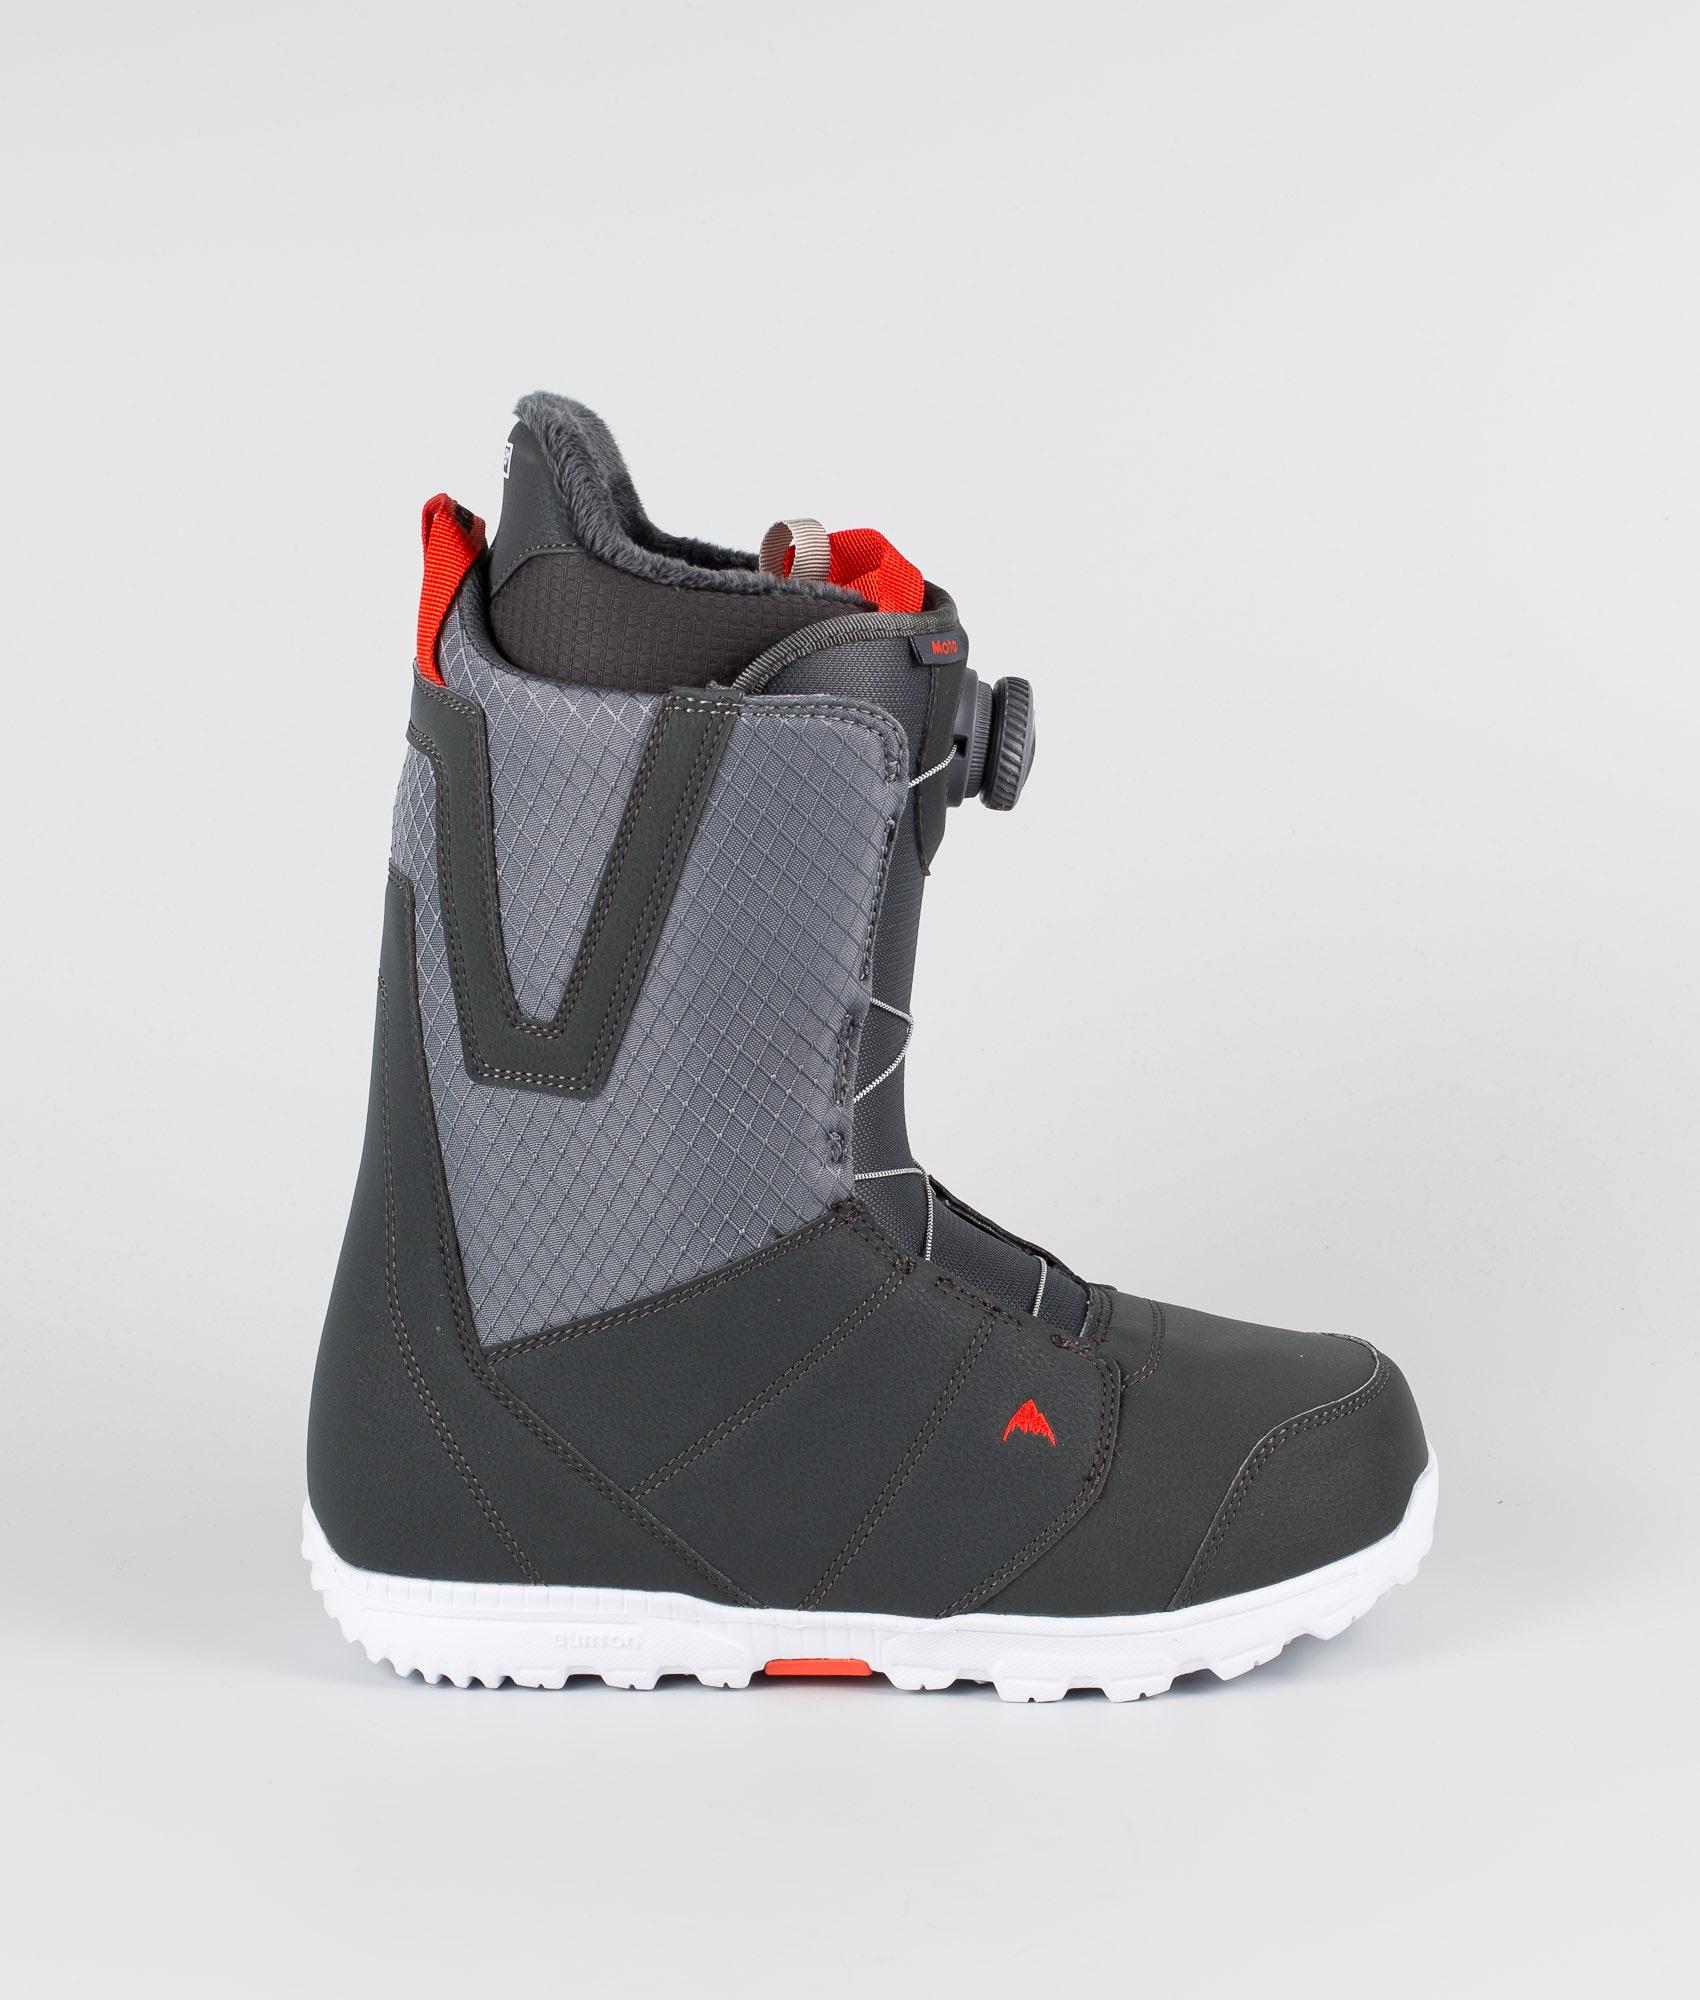 Burton Moto BOA Mens Snowboard Boots Sz 11.5 Gray//Red